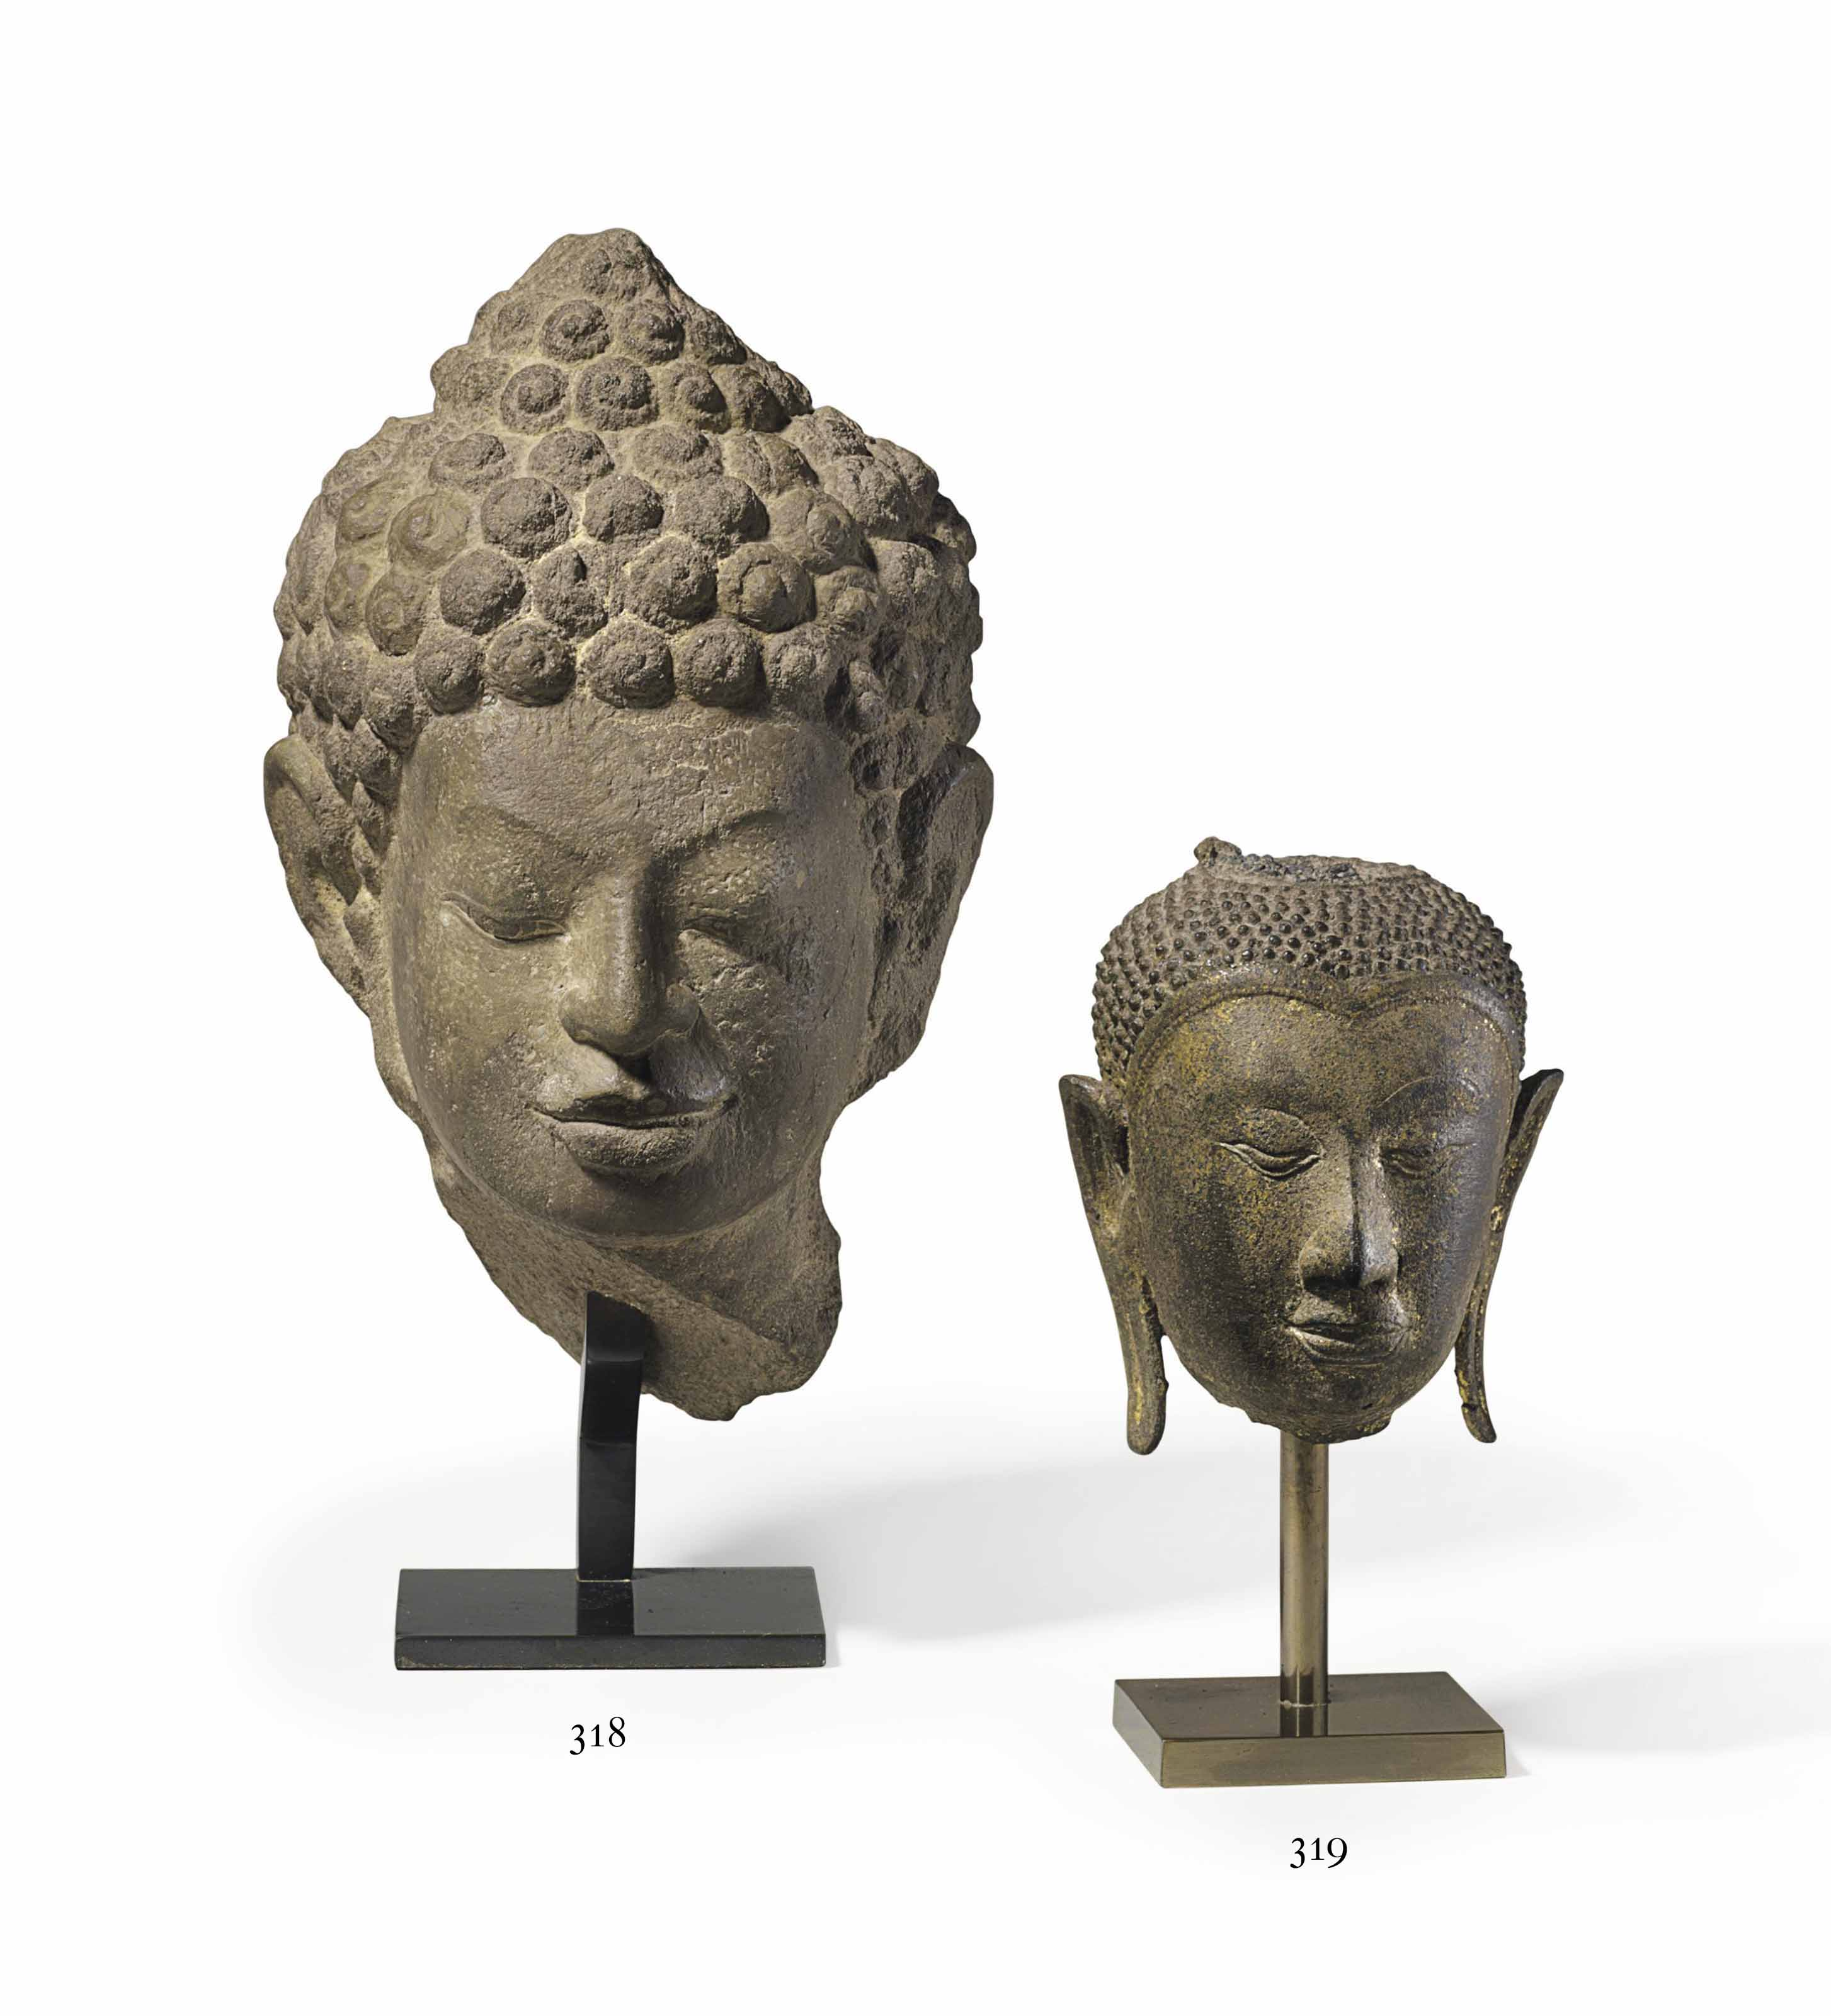 A gray sandstone head of Buddh